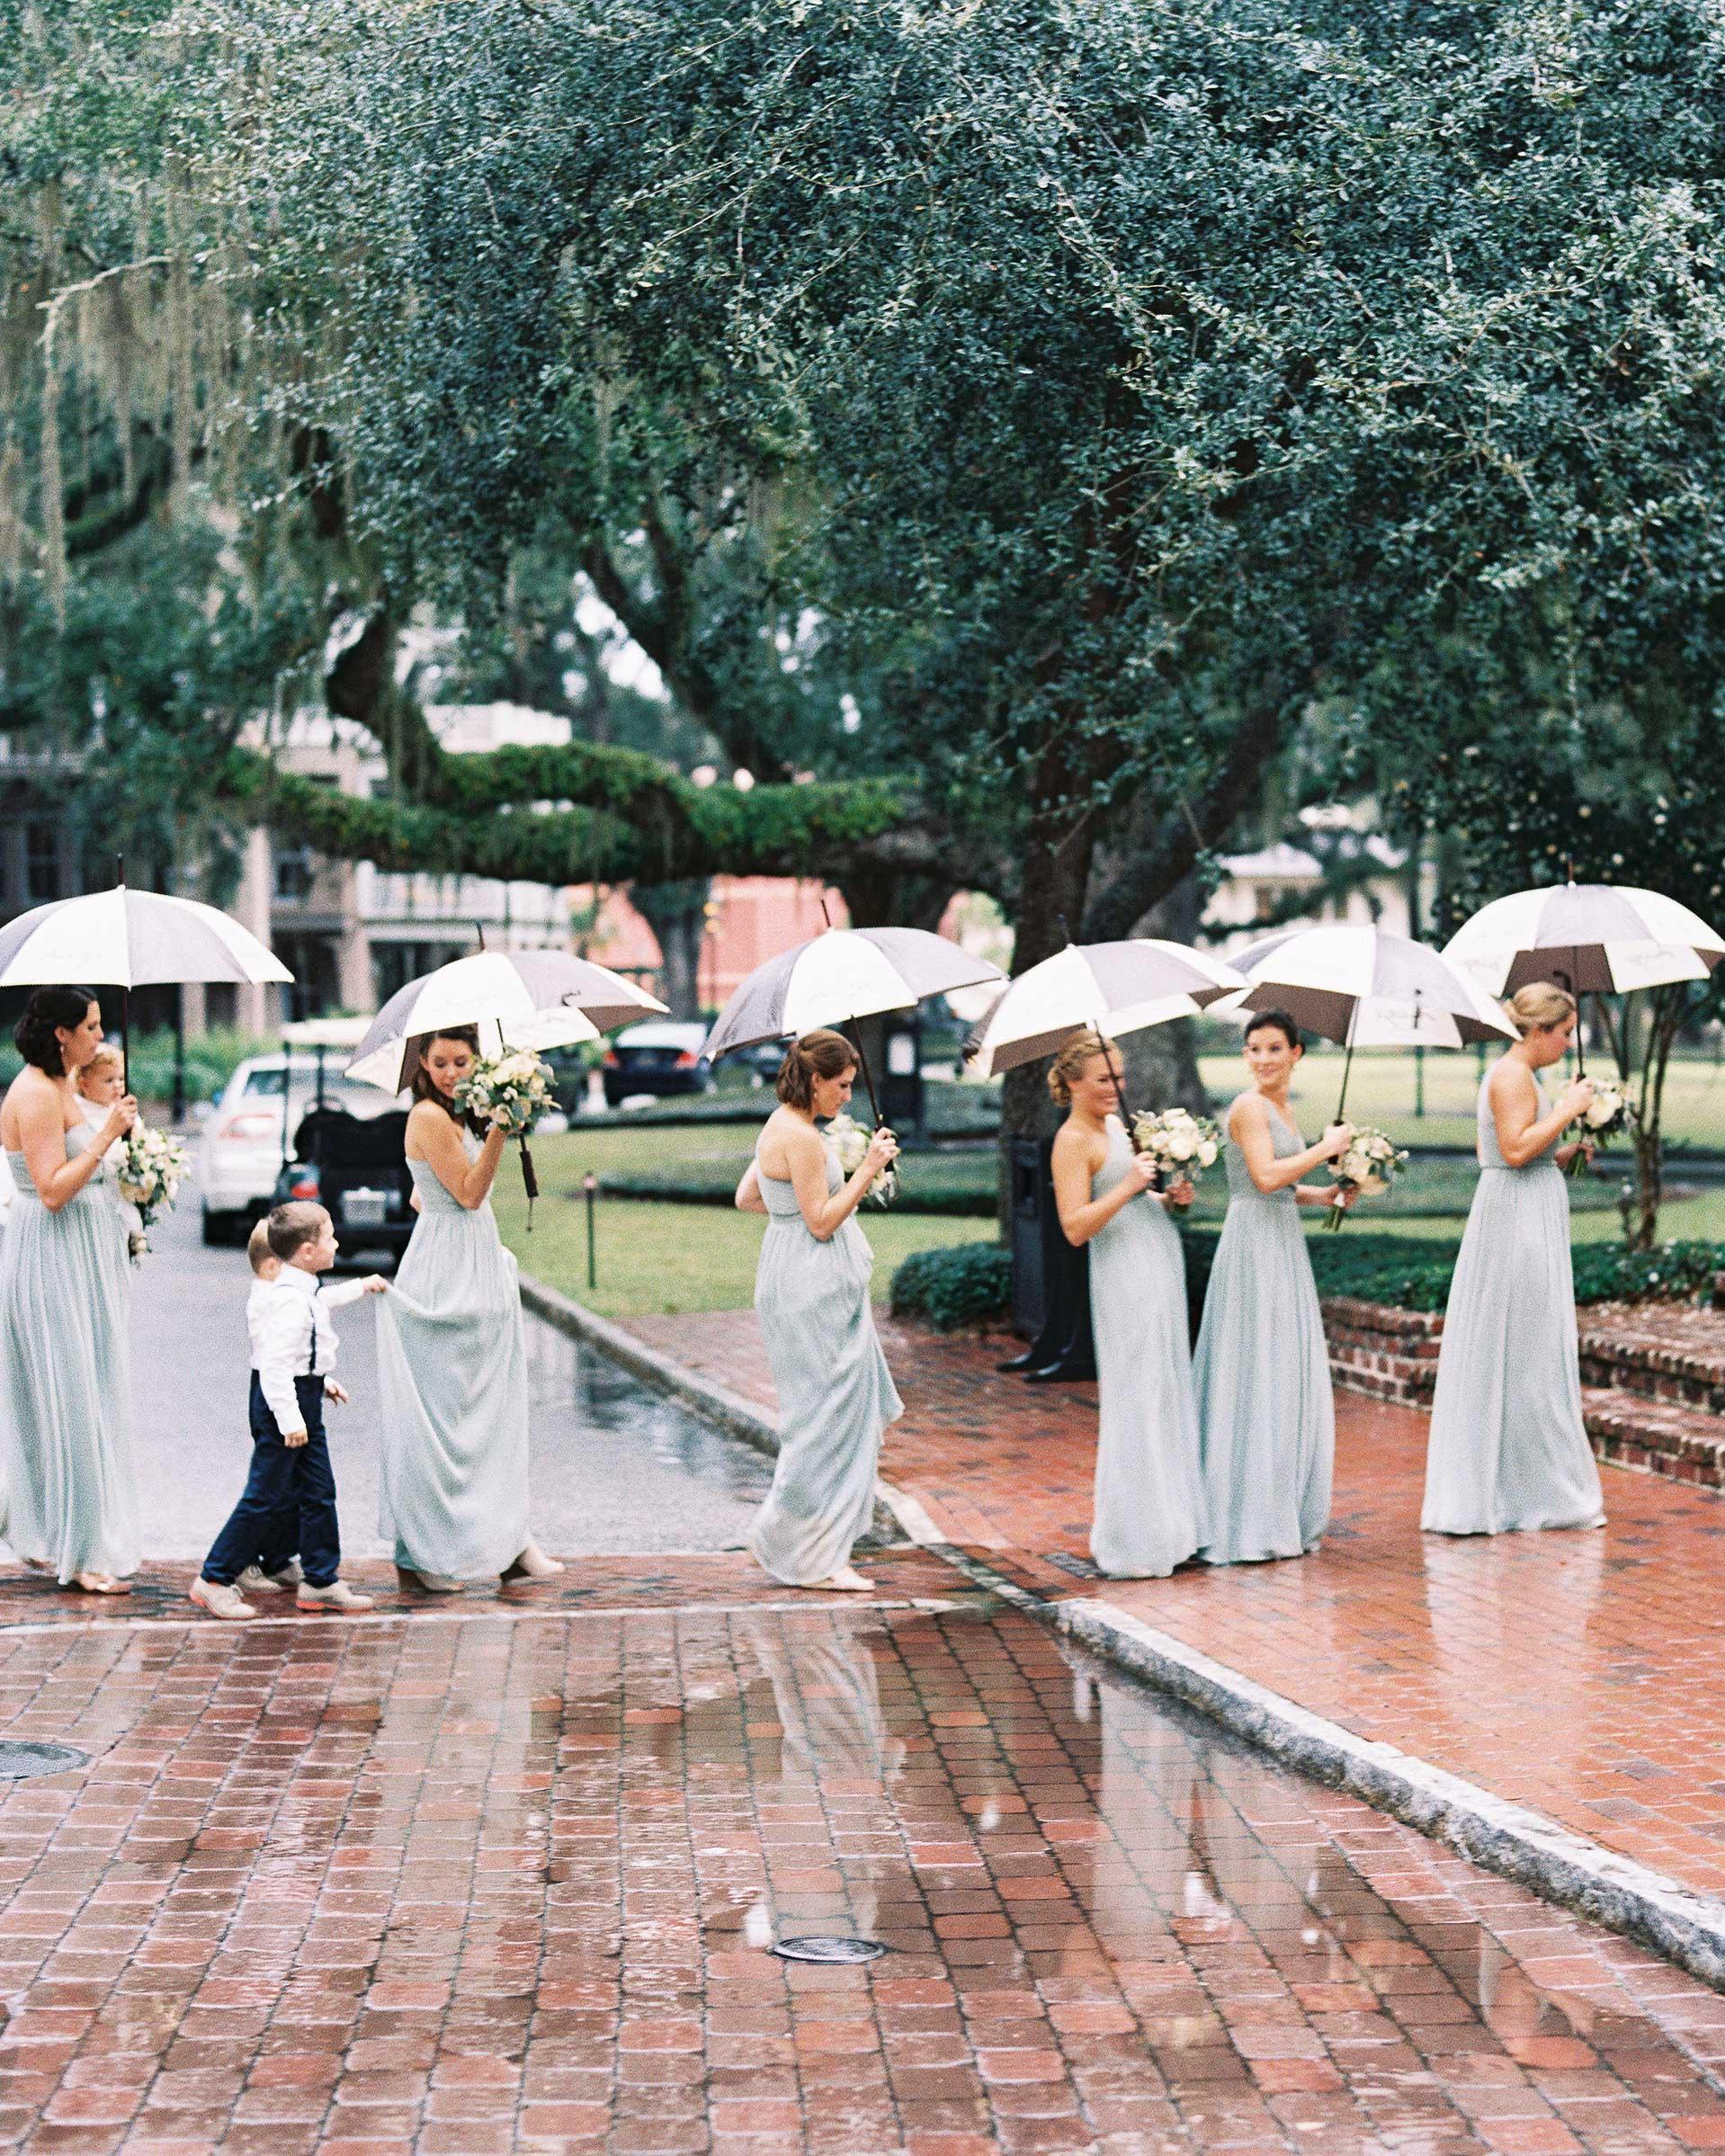 taylor-john-wedding-rain-bridesmaids-umbrella-19-s113035-0616.jpg